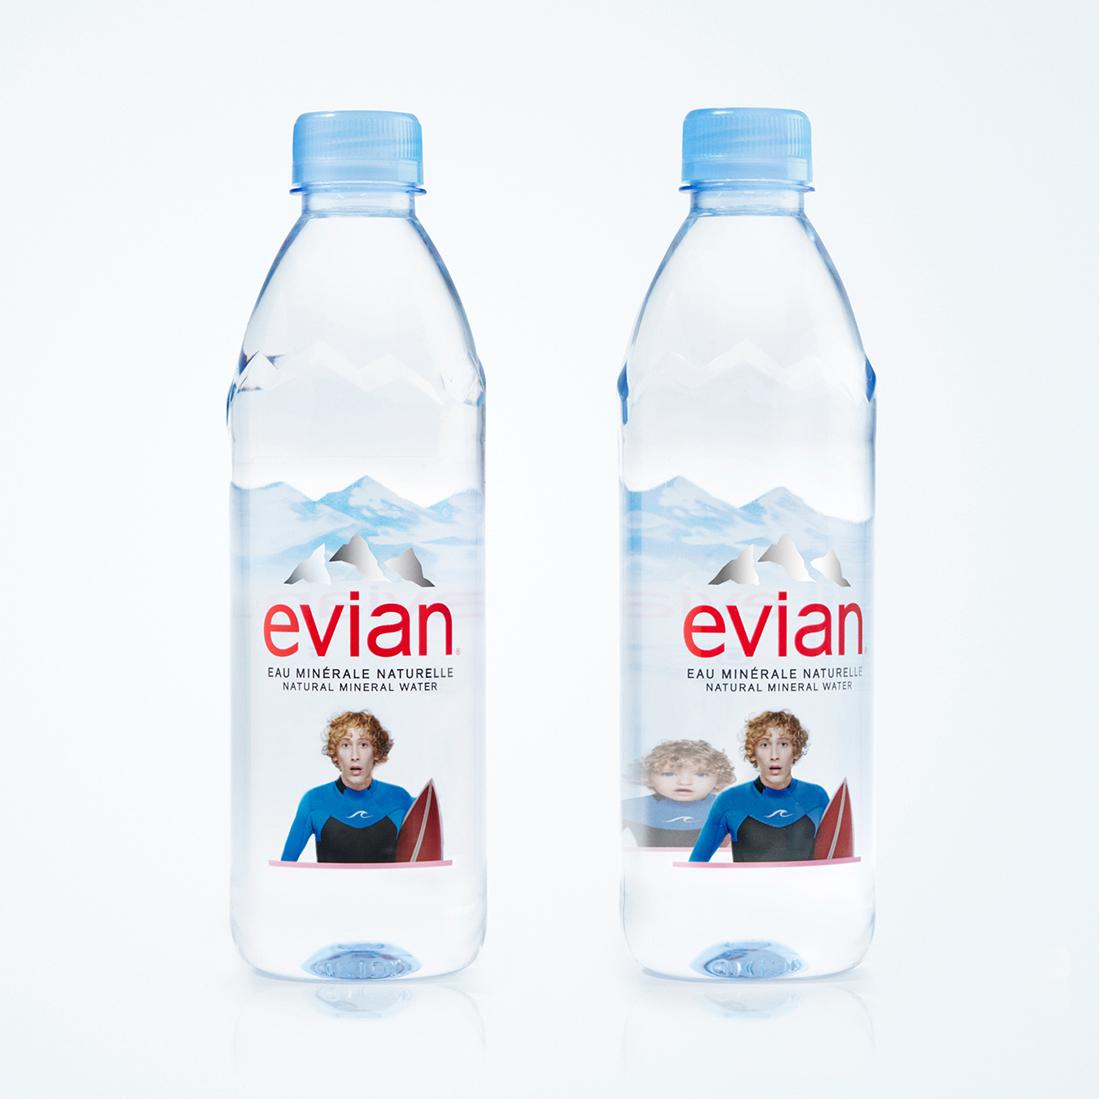 evian-bouteilles-eau-packaging-surf-edition-limitee-surf-baby-bay-publicite-2016-betc